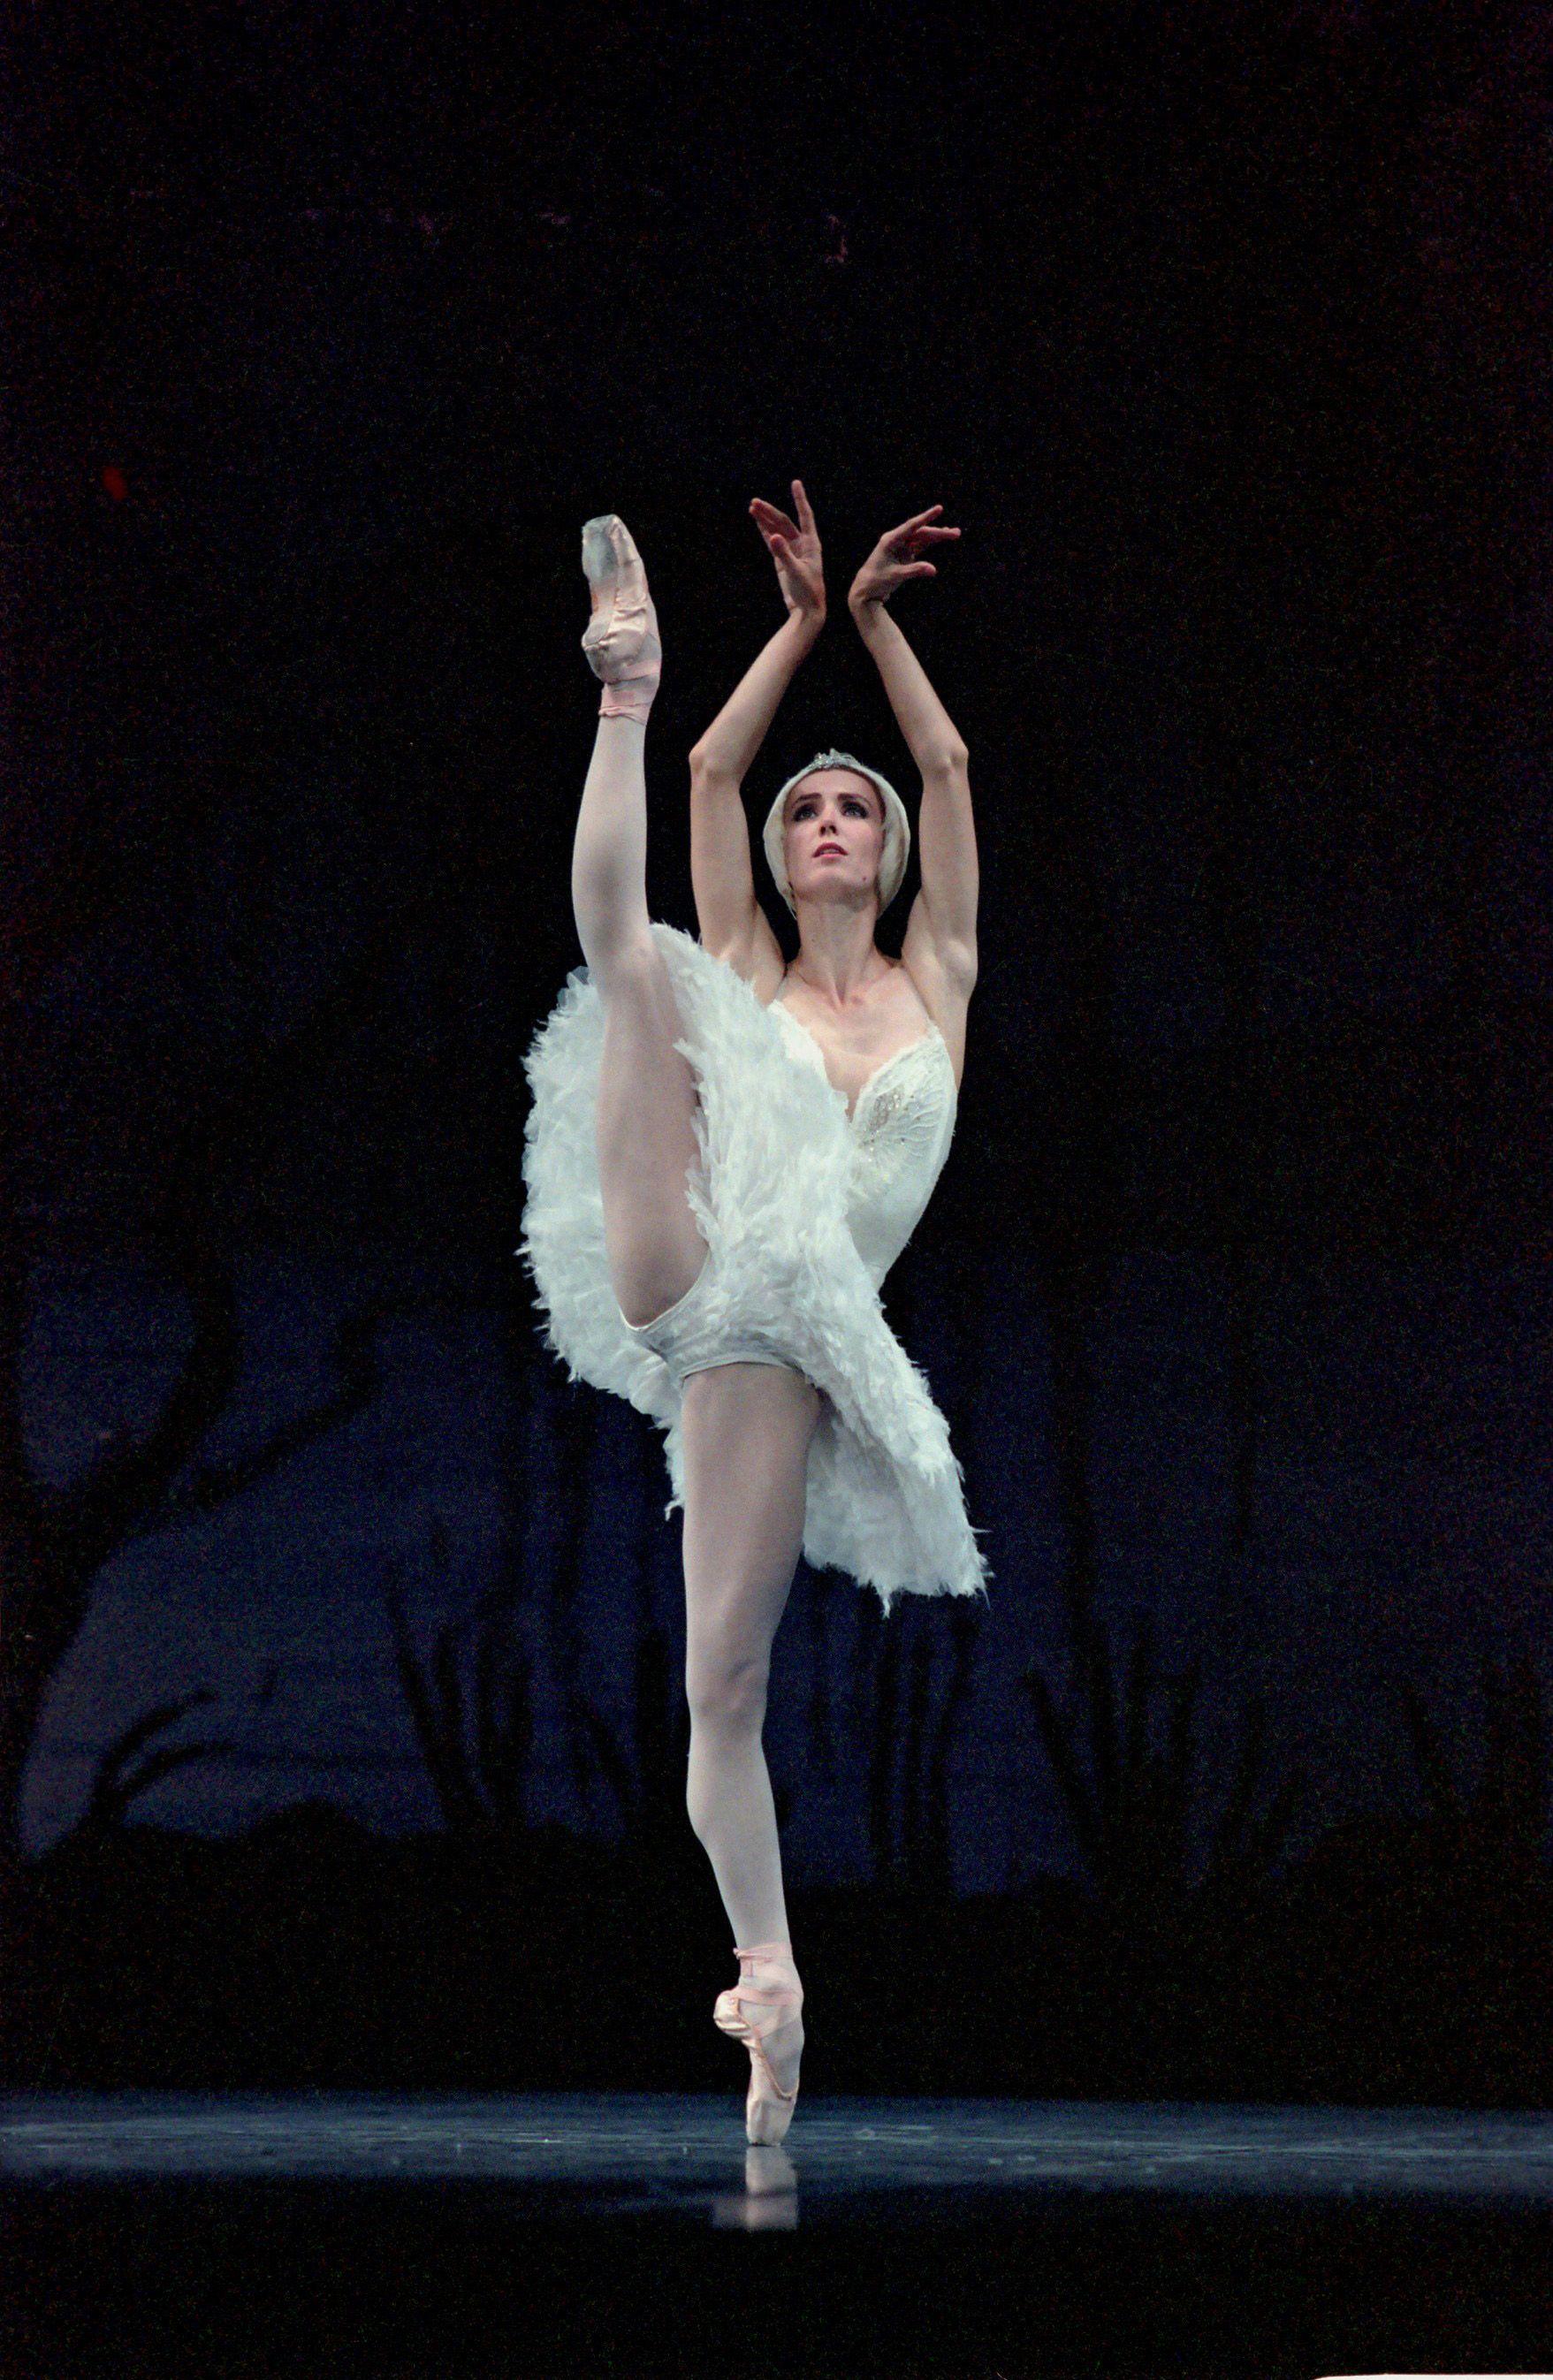 Ballerina Yevgenia Obraztsova: career, repertoire, personal life 6